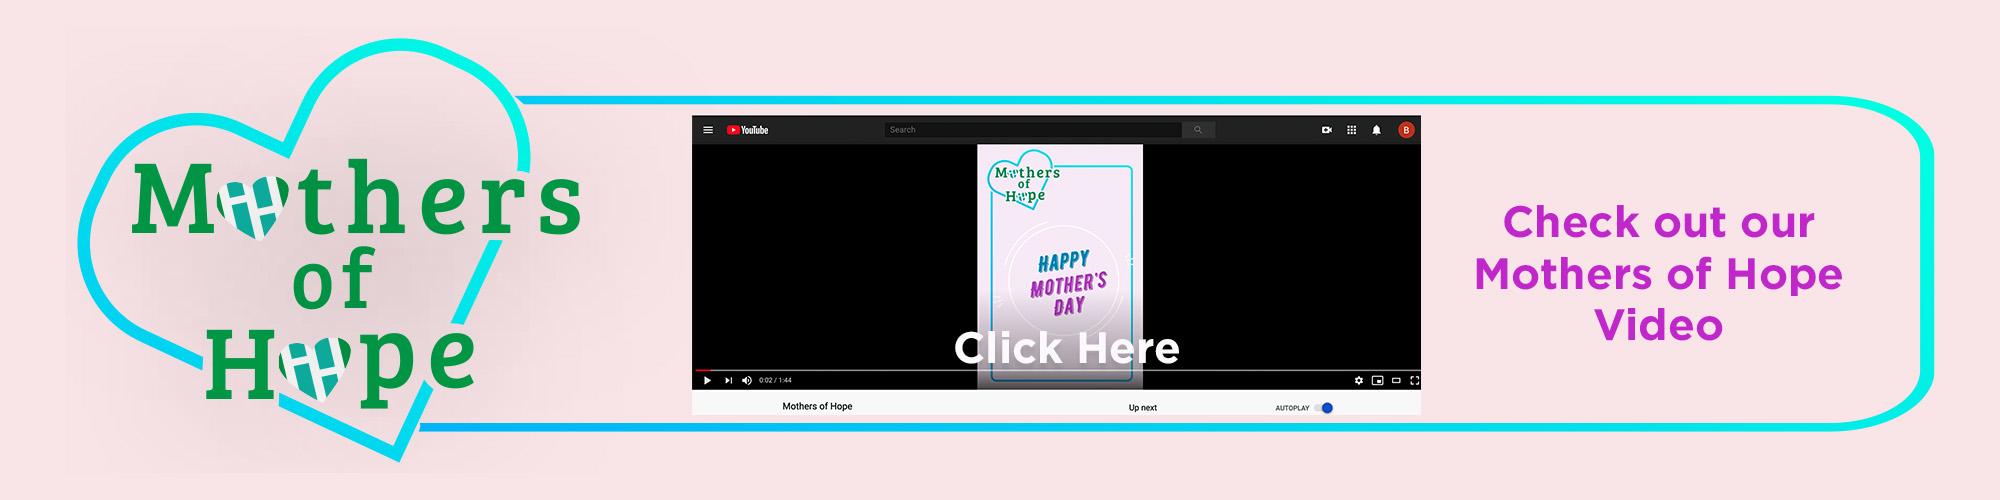 video-web-banner